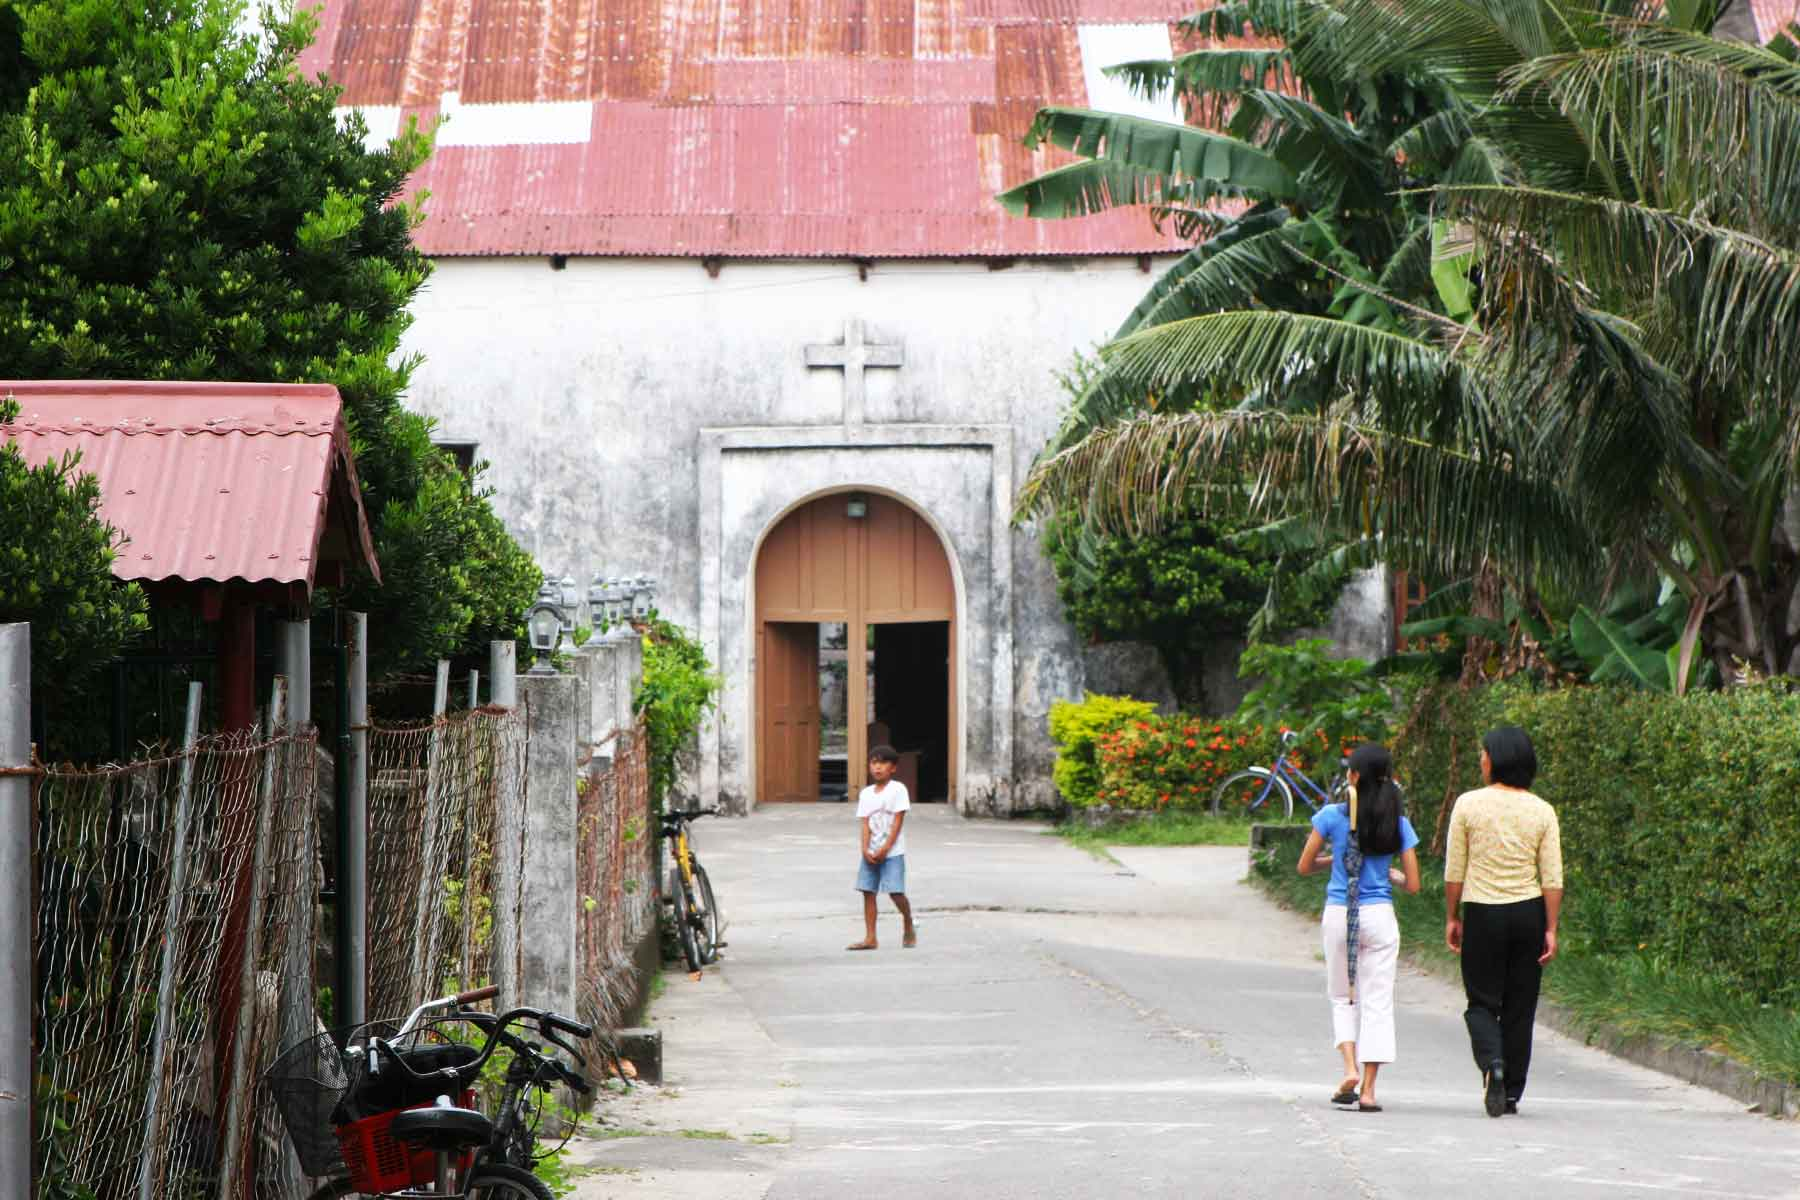 Batanes Islands Philippines - Austronesian Studies - Ivatan Culture - Catholic Church - Dr Steven Andrew Martin